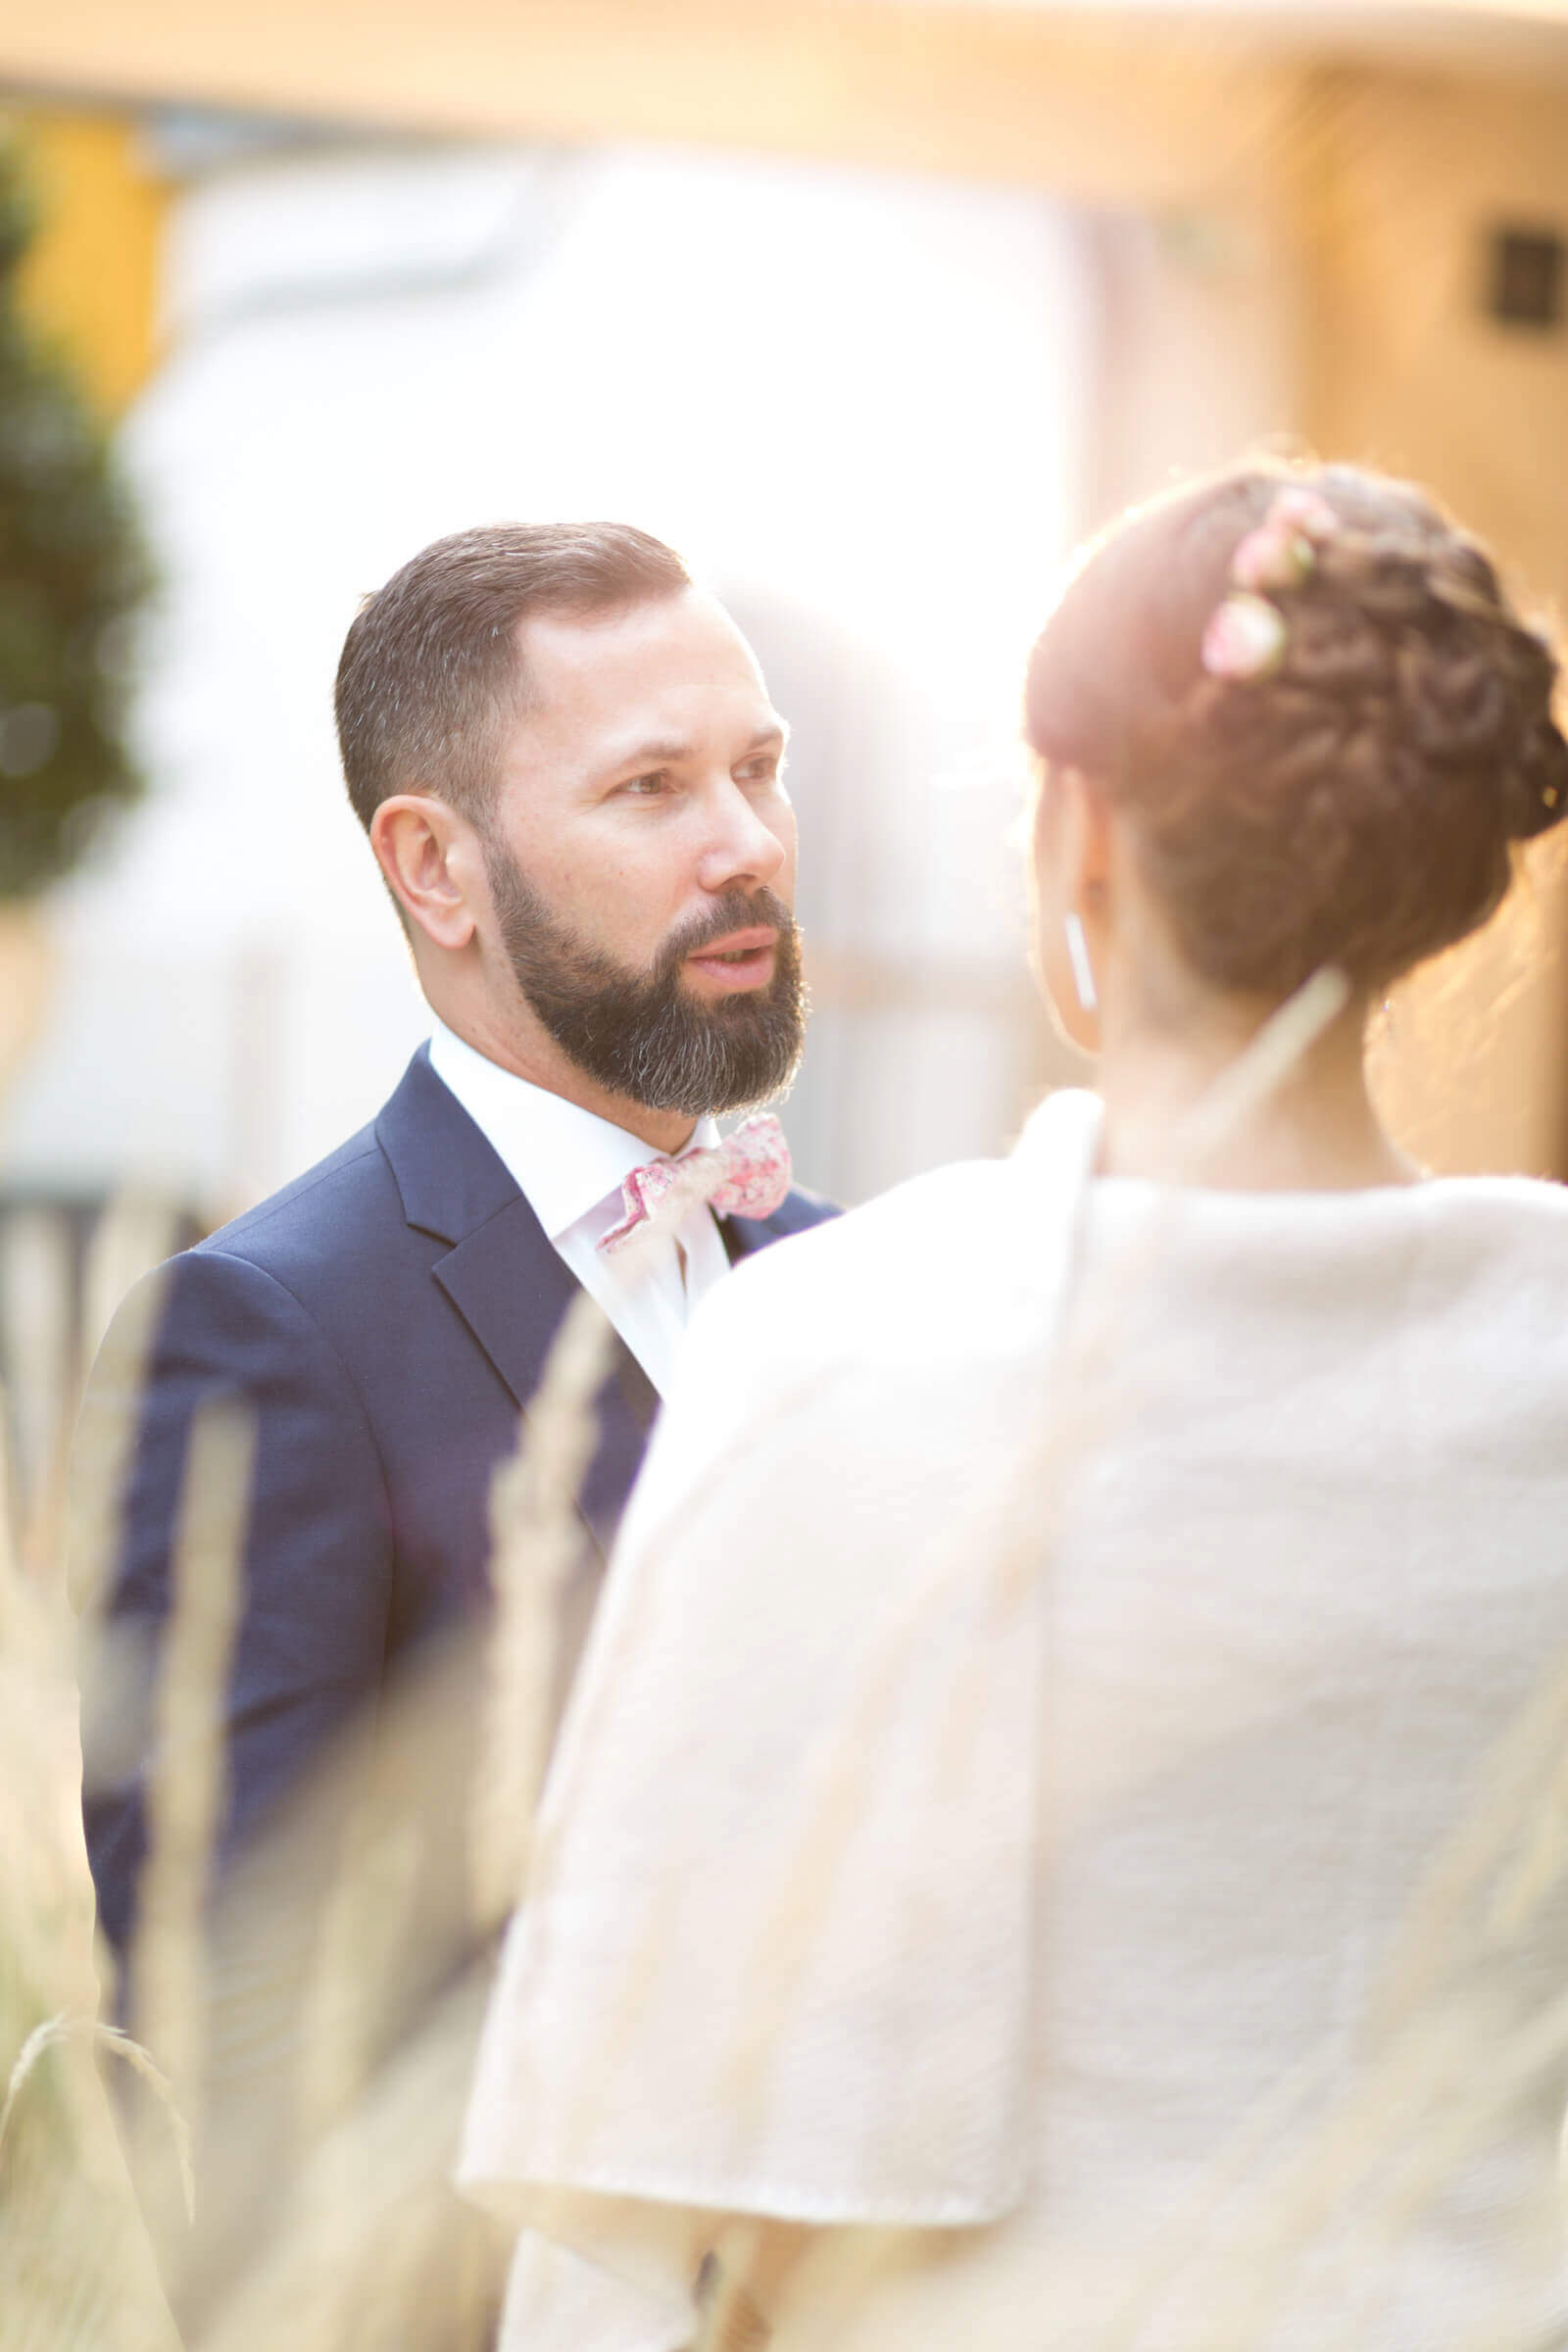 Photographe epernay Photo mariage Tristan Meunier-11.jpg